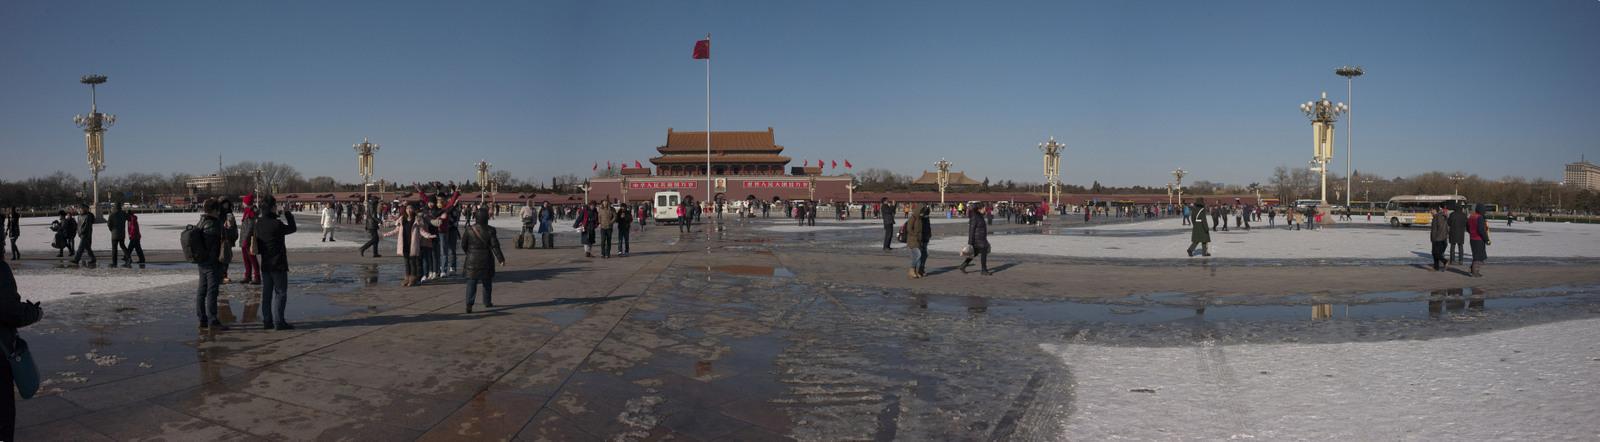 Pano_Tiananmen